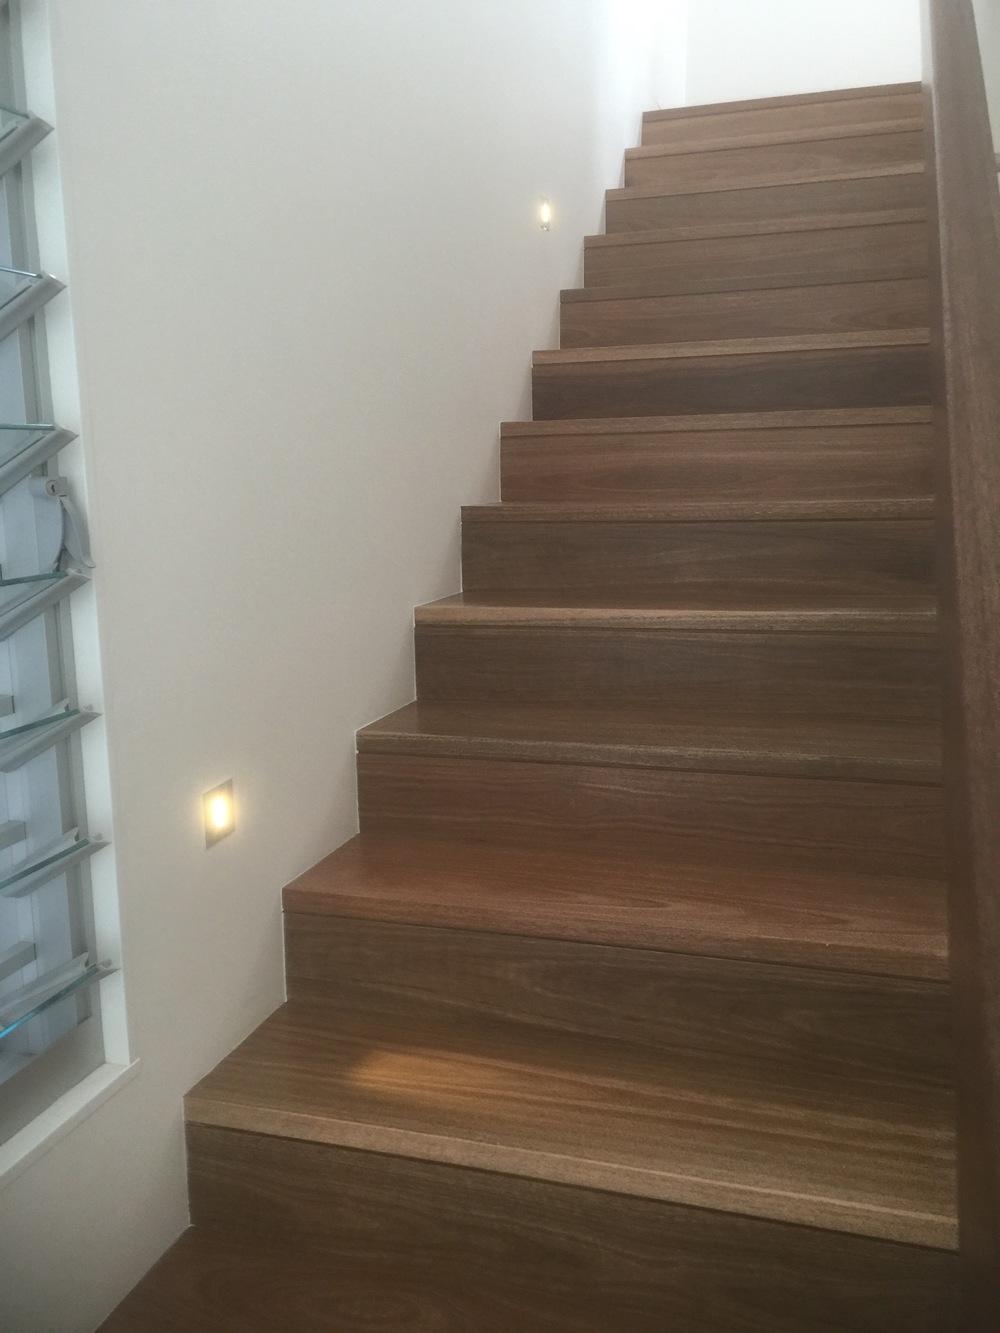 Stairwell lighting, tread lighting and path lighting